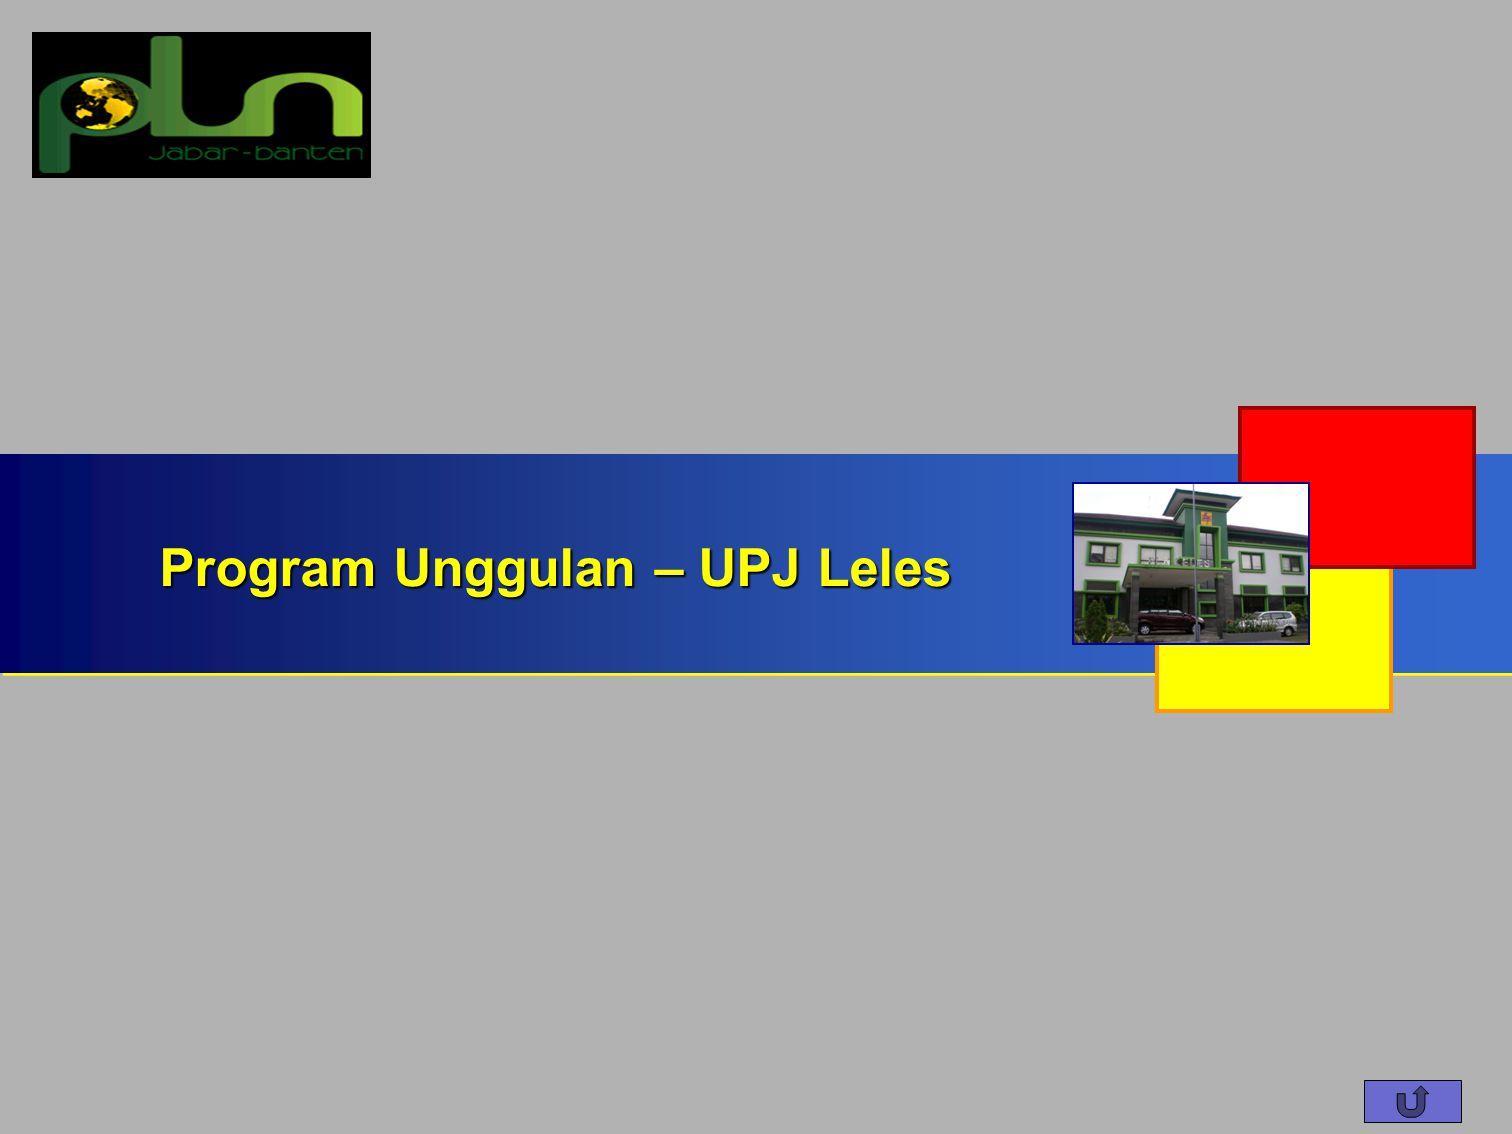 Program Unggulan – UPJ Leles Program Unggulan – UPJ Leles